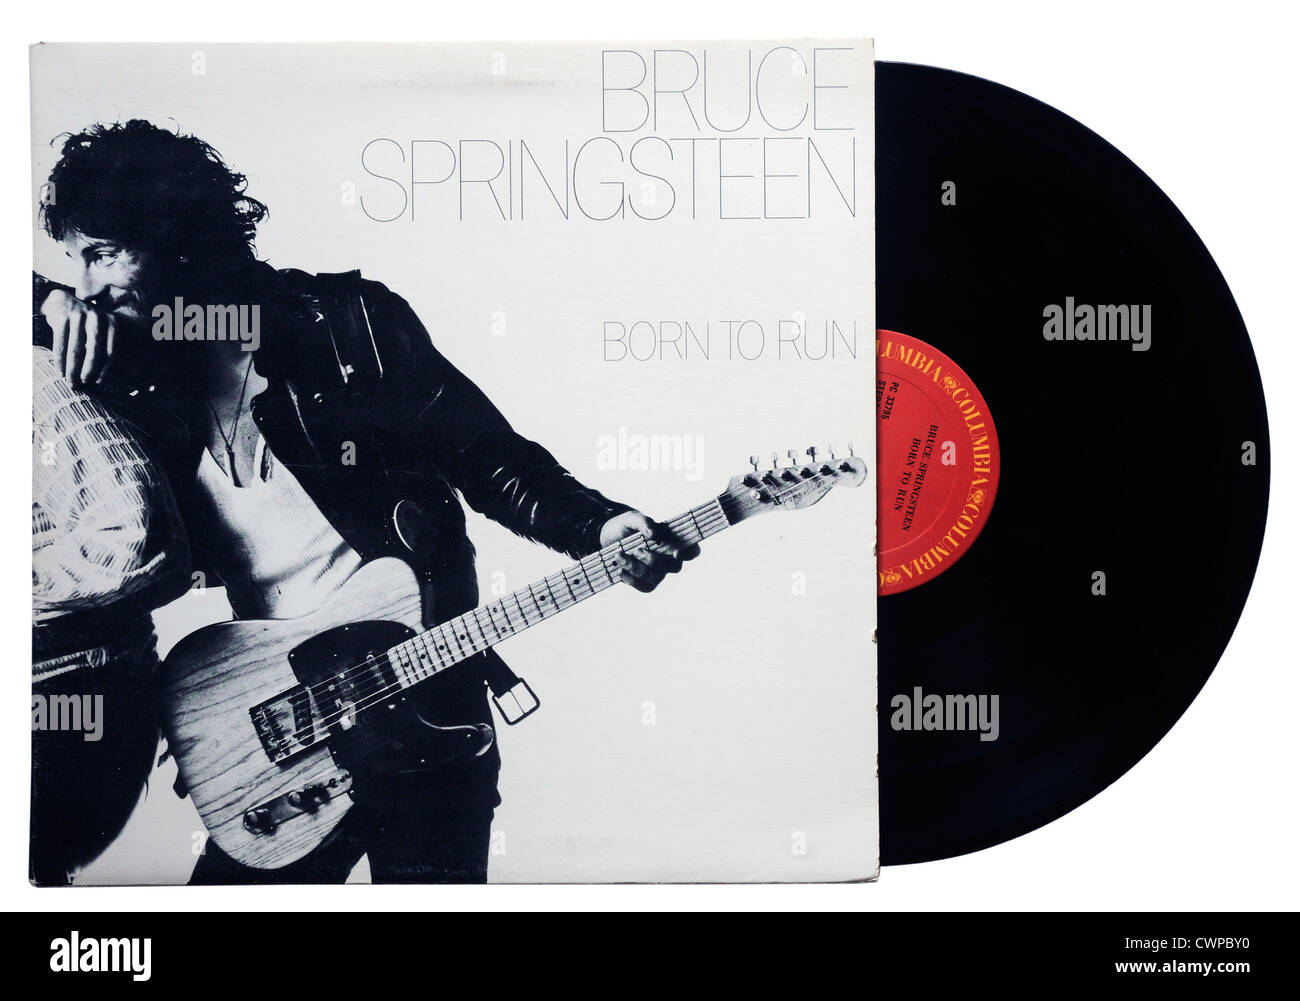 Bruce Springsteen Born to Run album - Stock Image